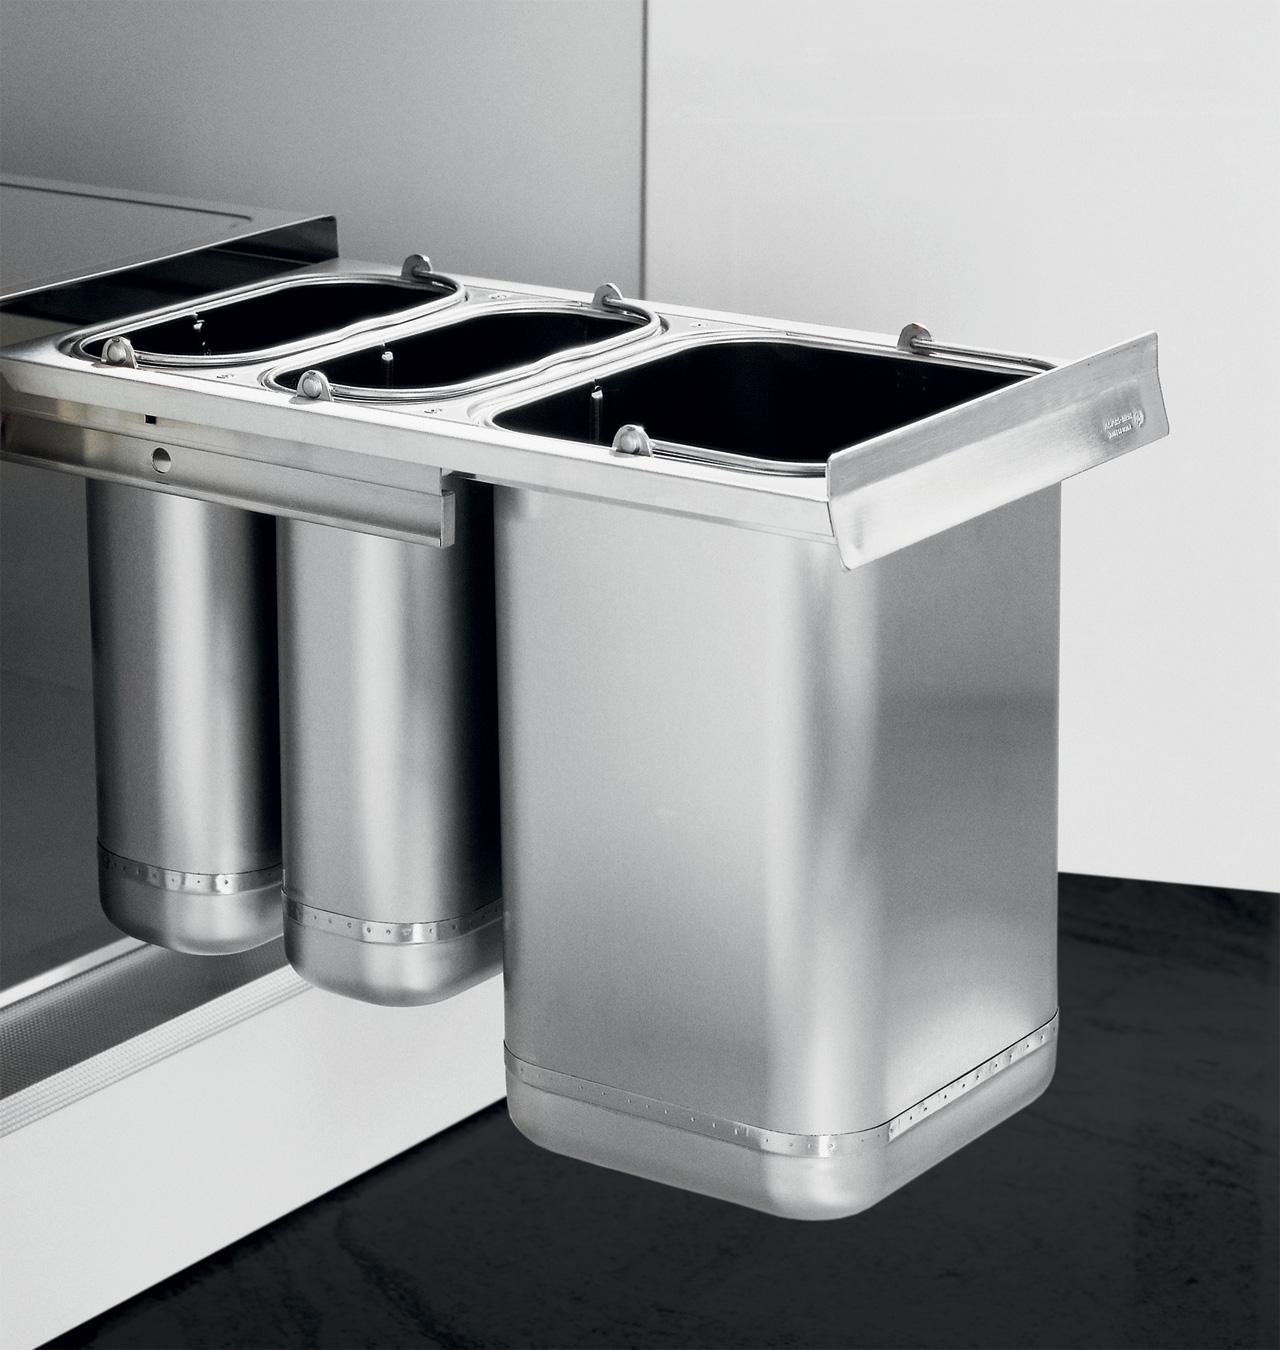 kitchendesigns.com